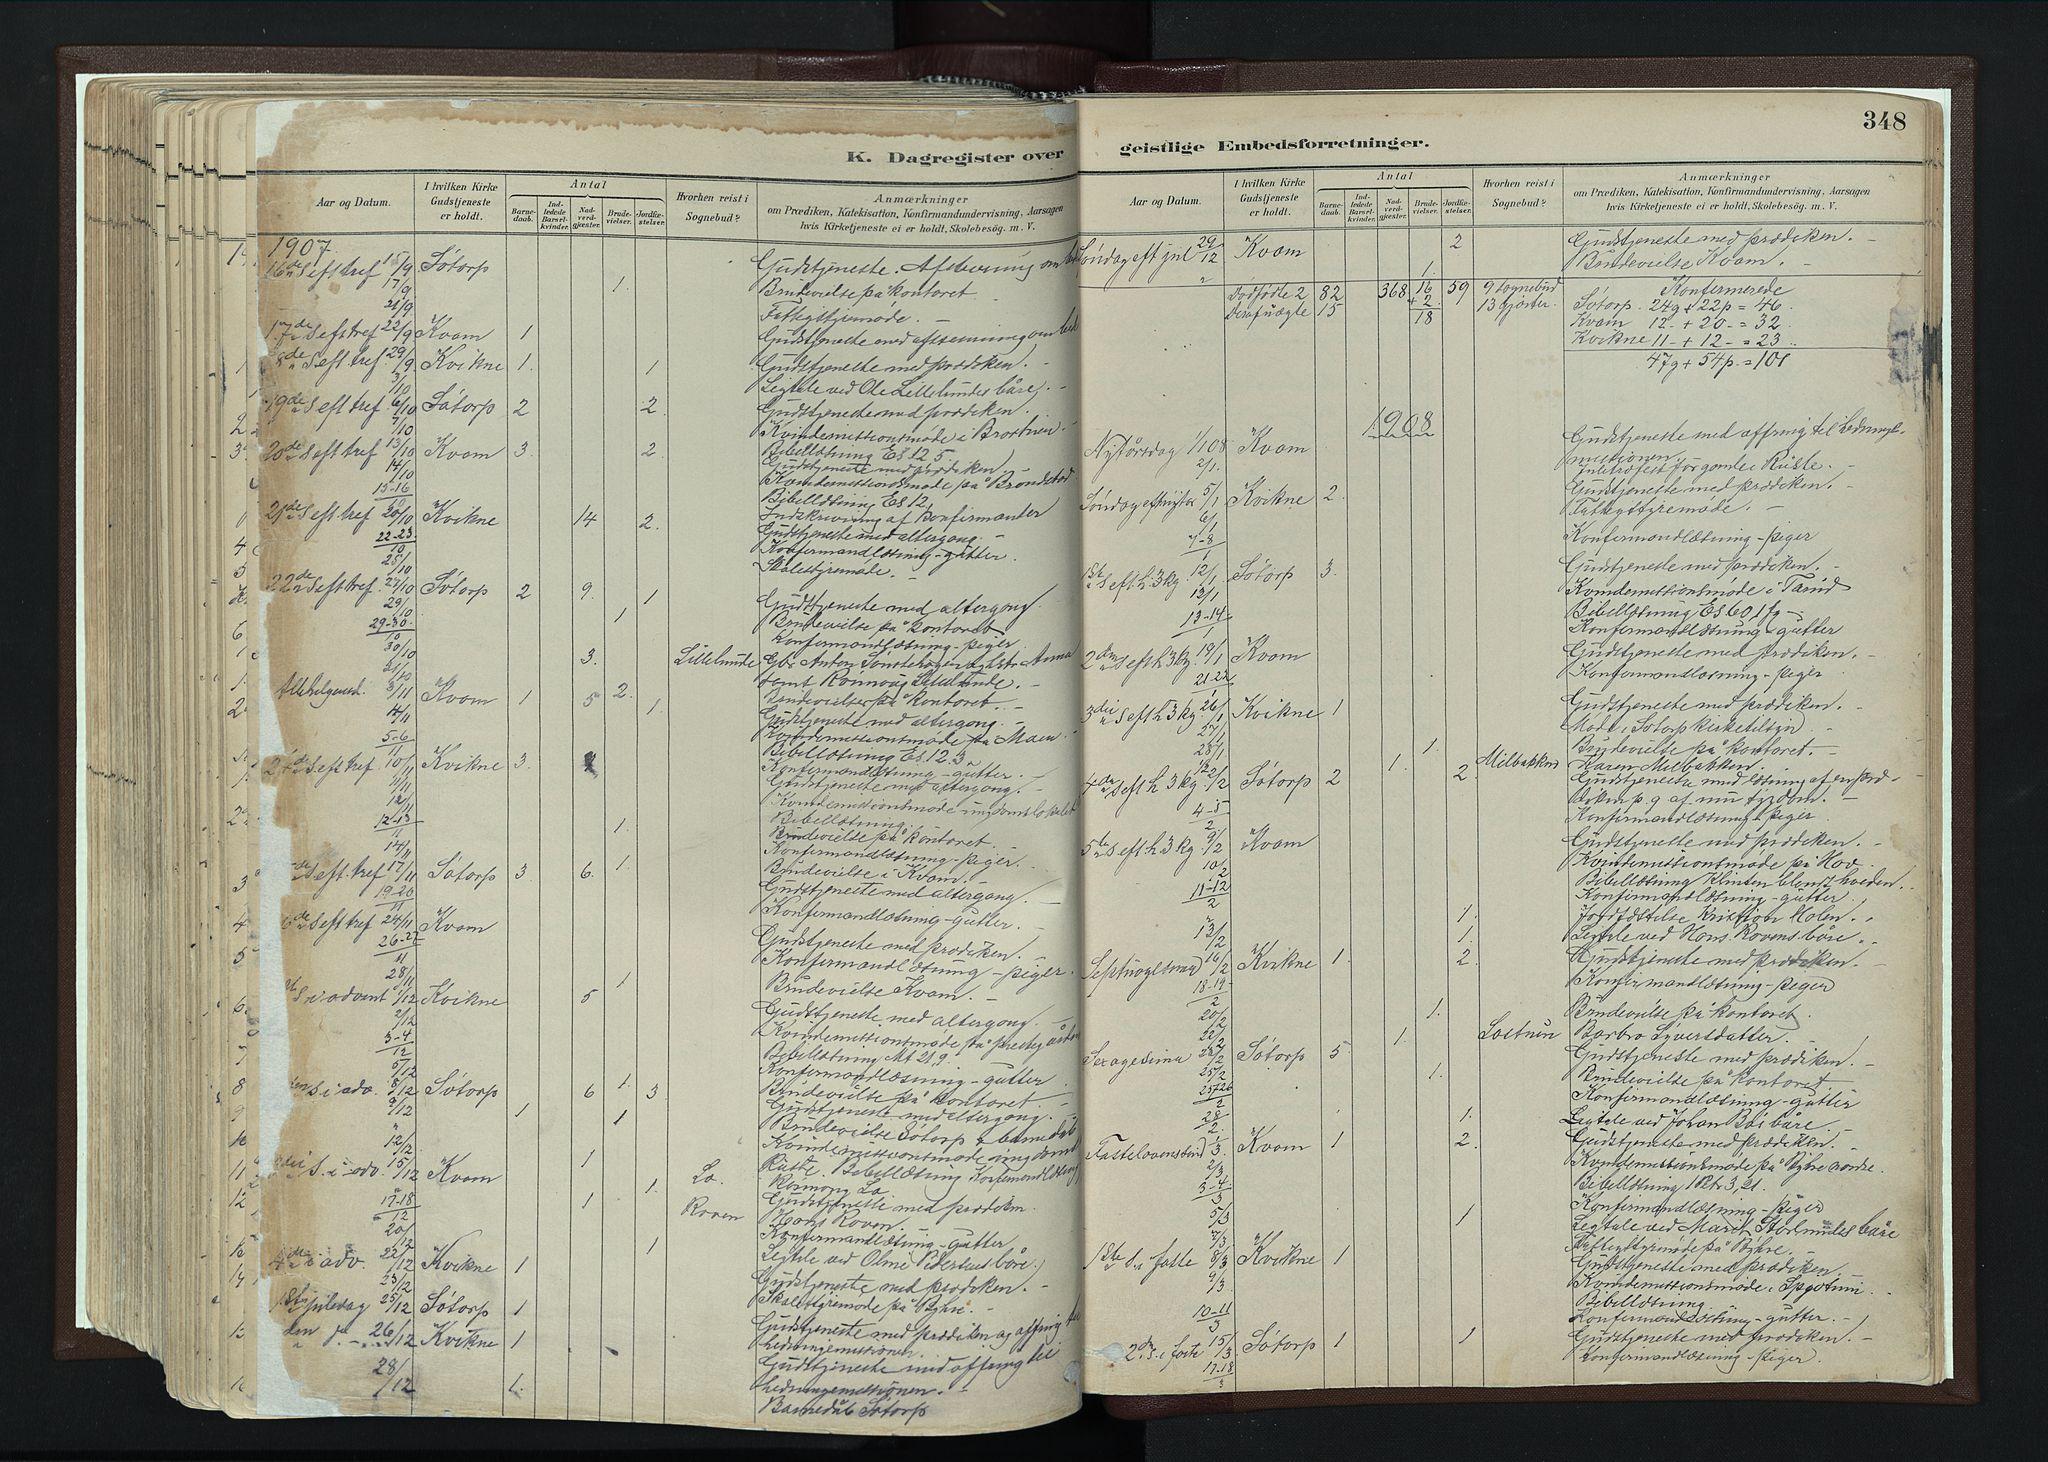 SAH, Nord-Fron prestekontor, Ministerialbok nr. 4, 1884-1914, s. 348